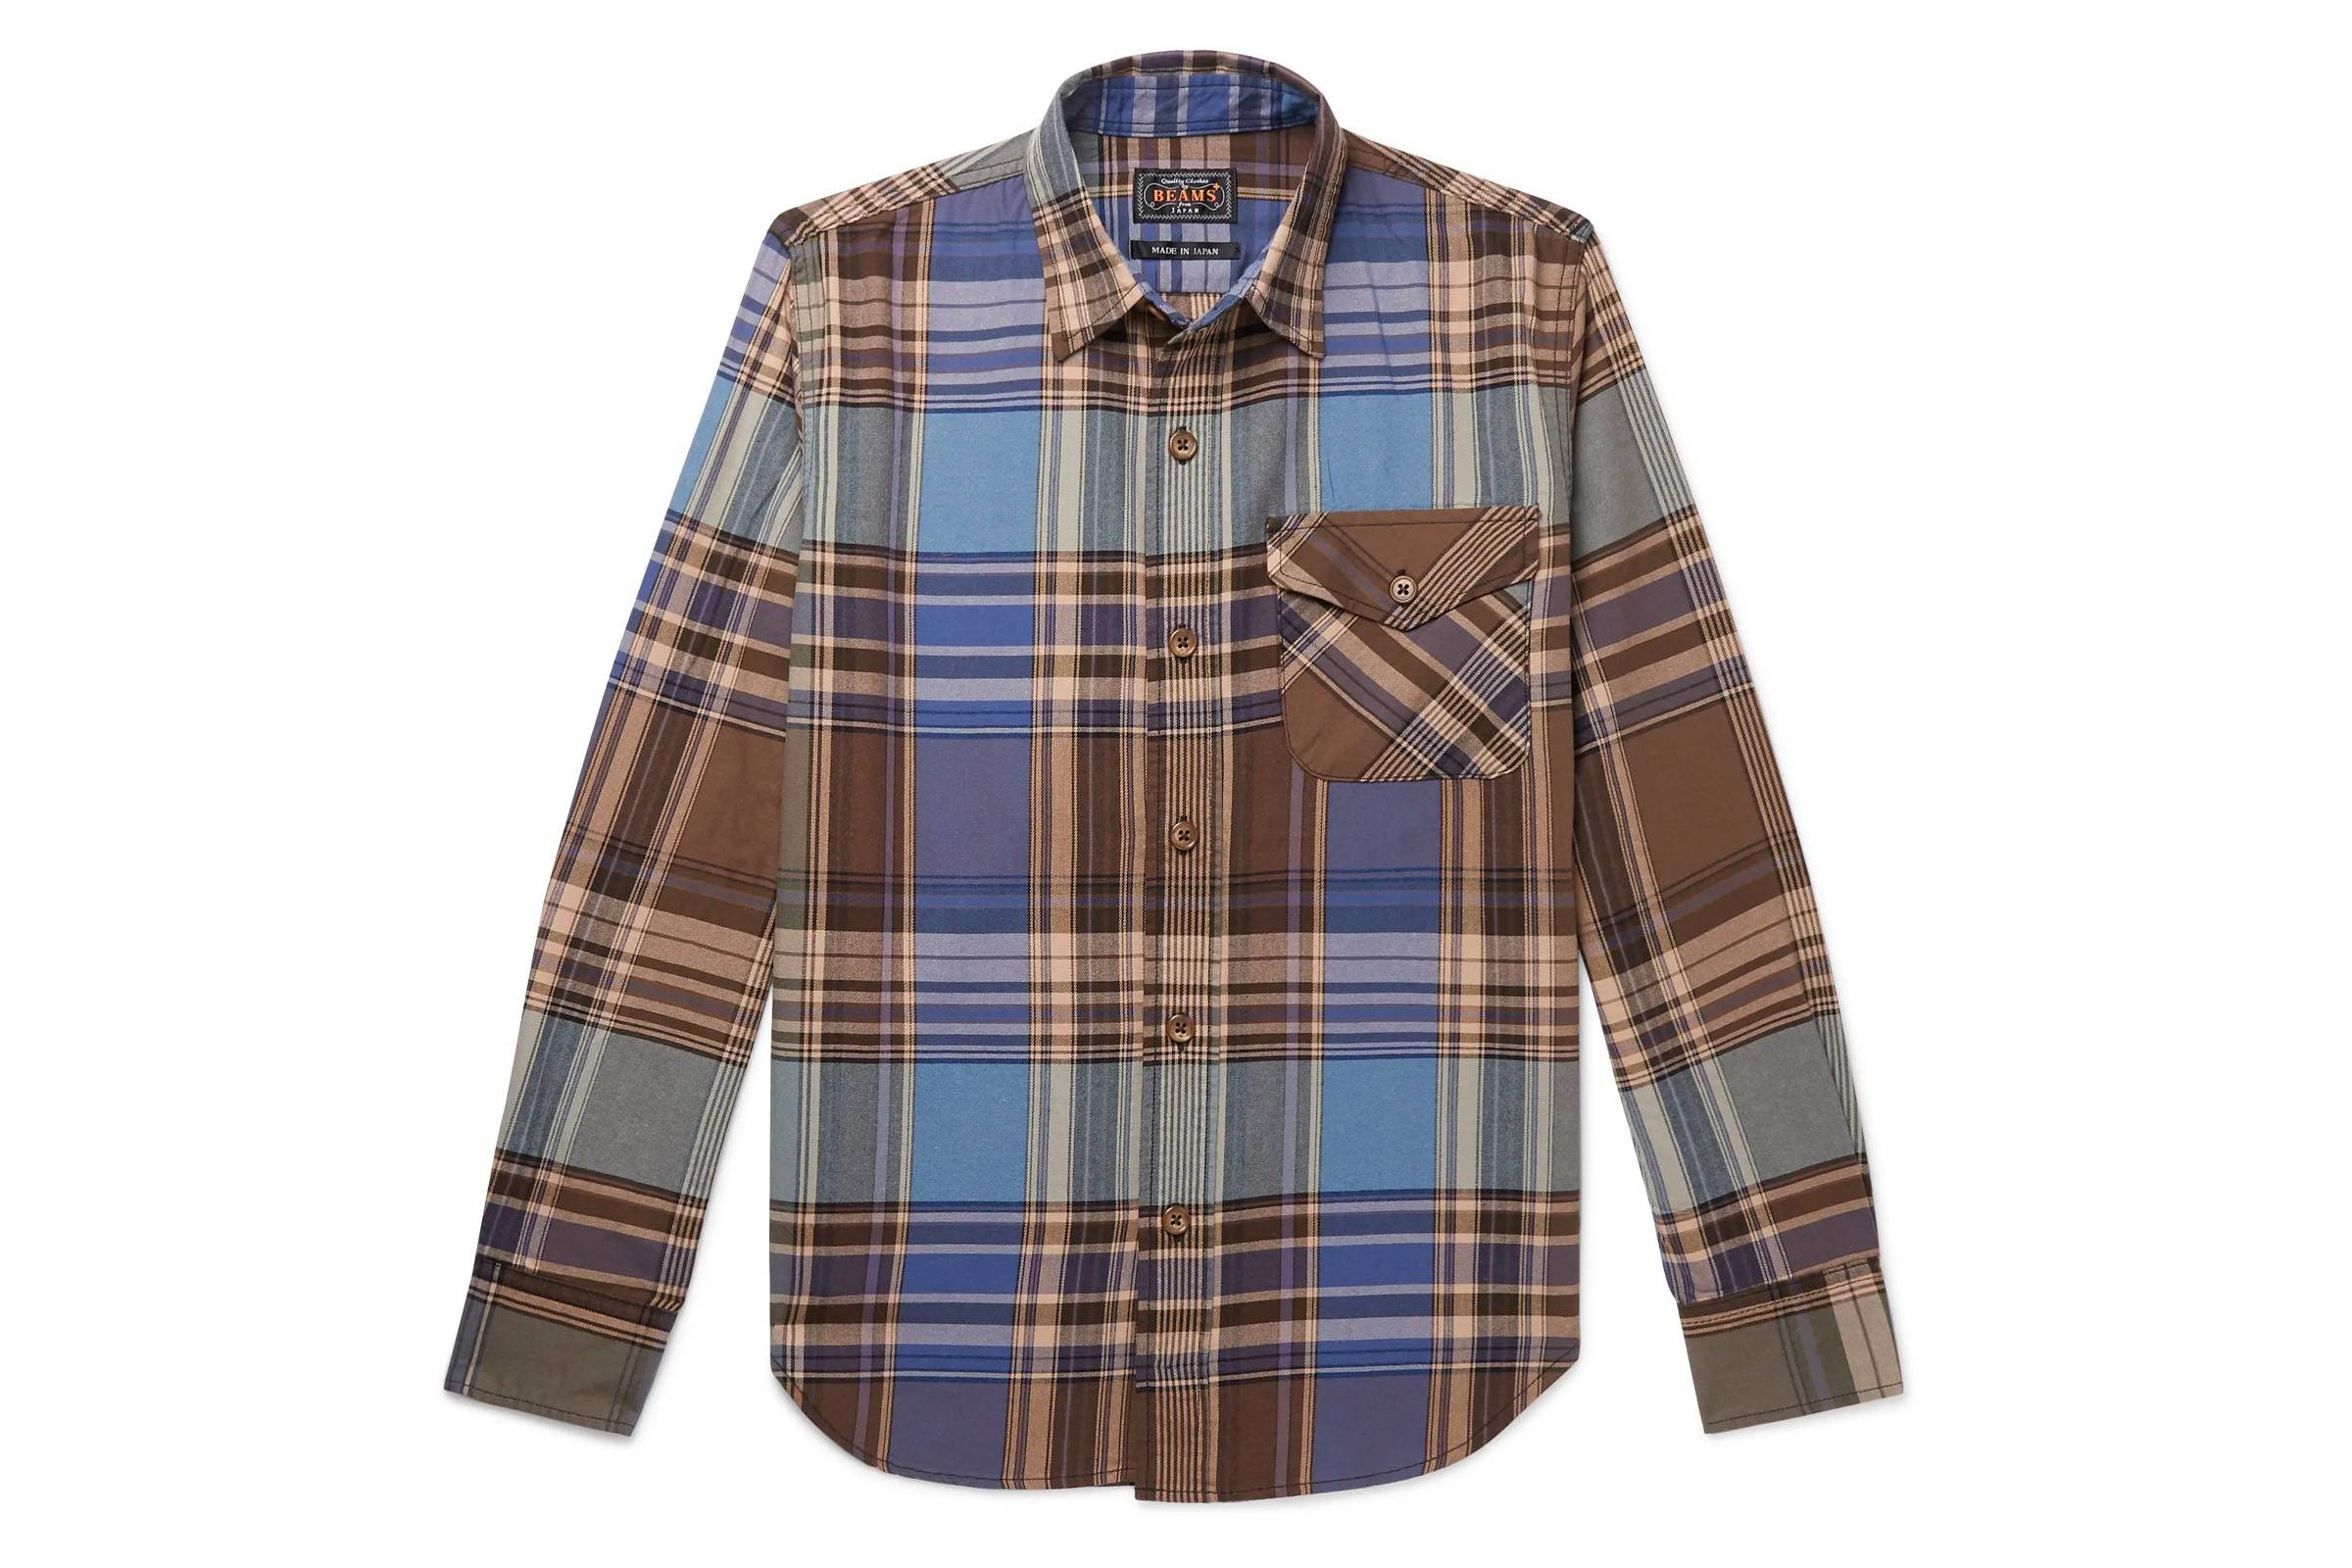 12. Beams Plus Flannel Shirt